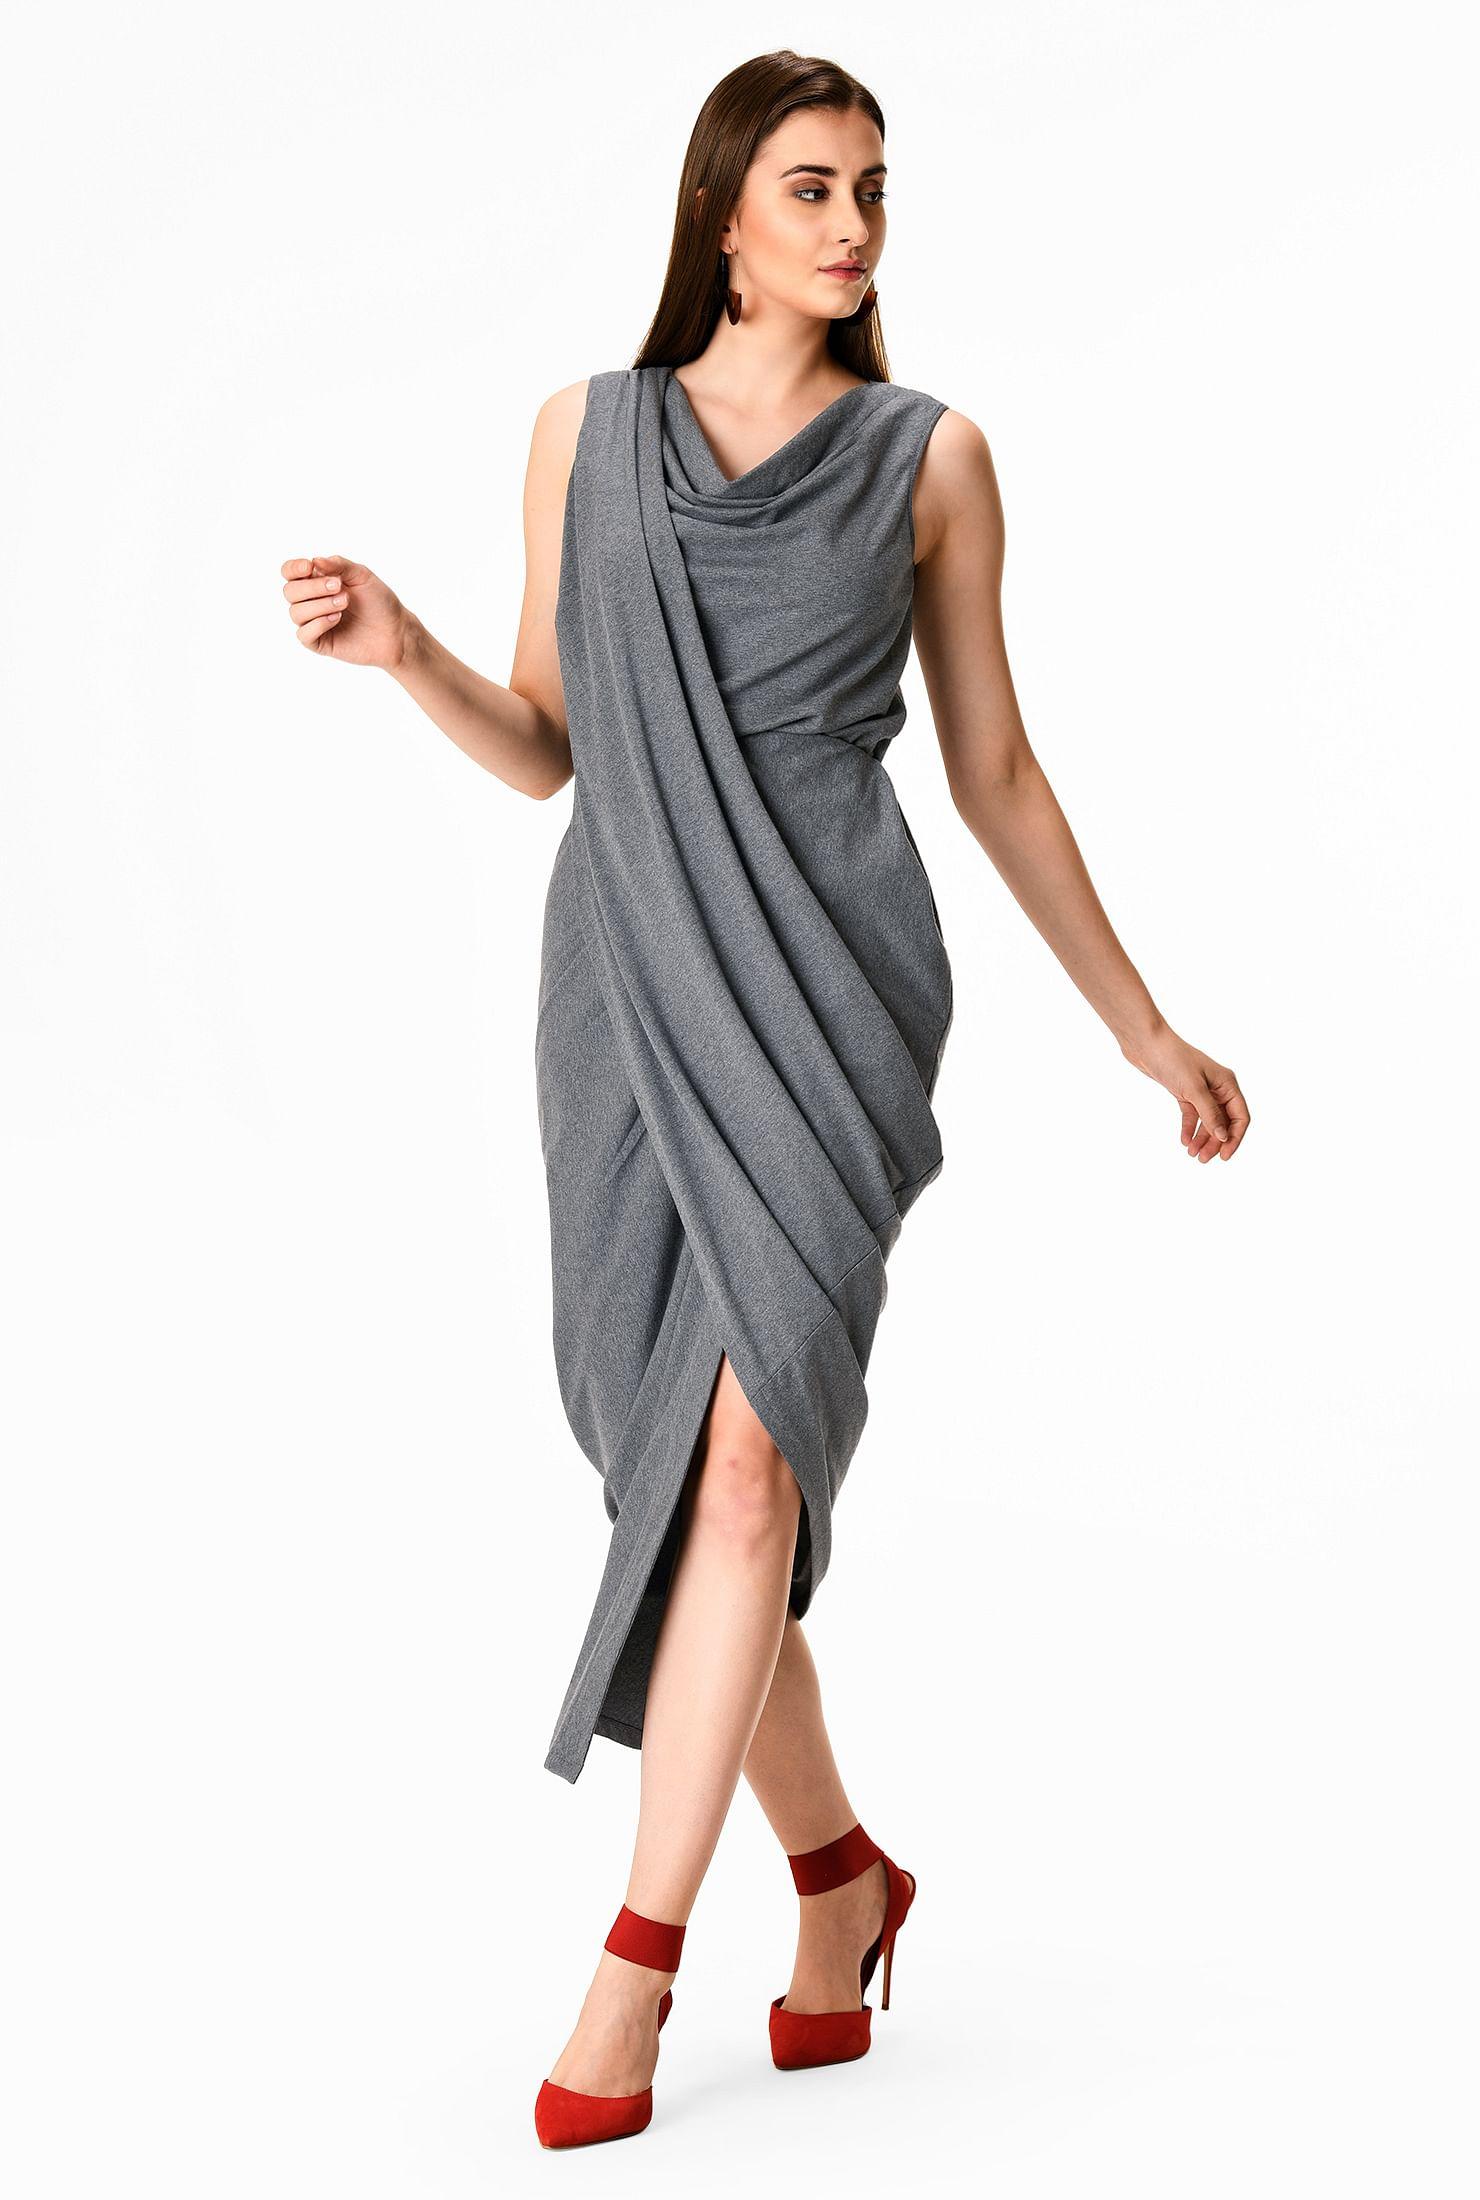 Grecian drape cotton knit sheath dress